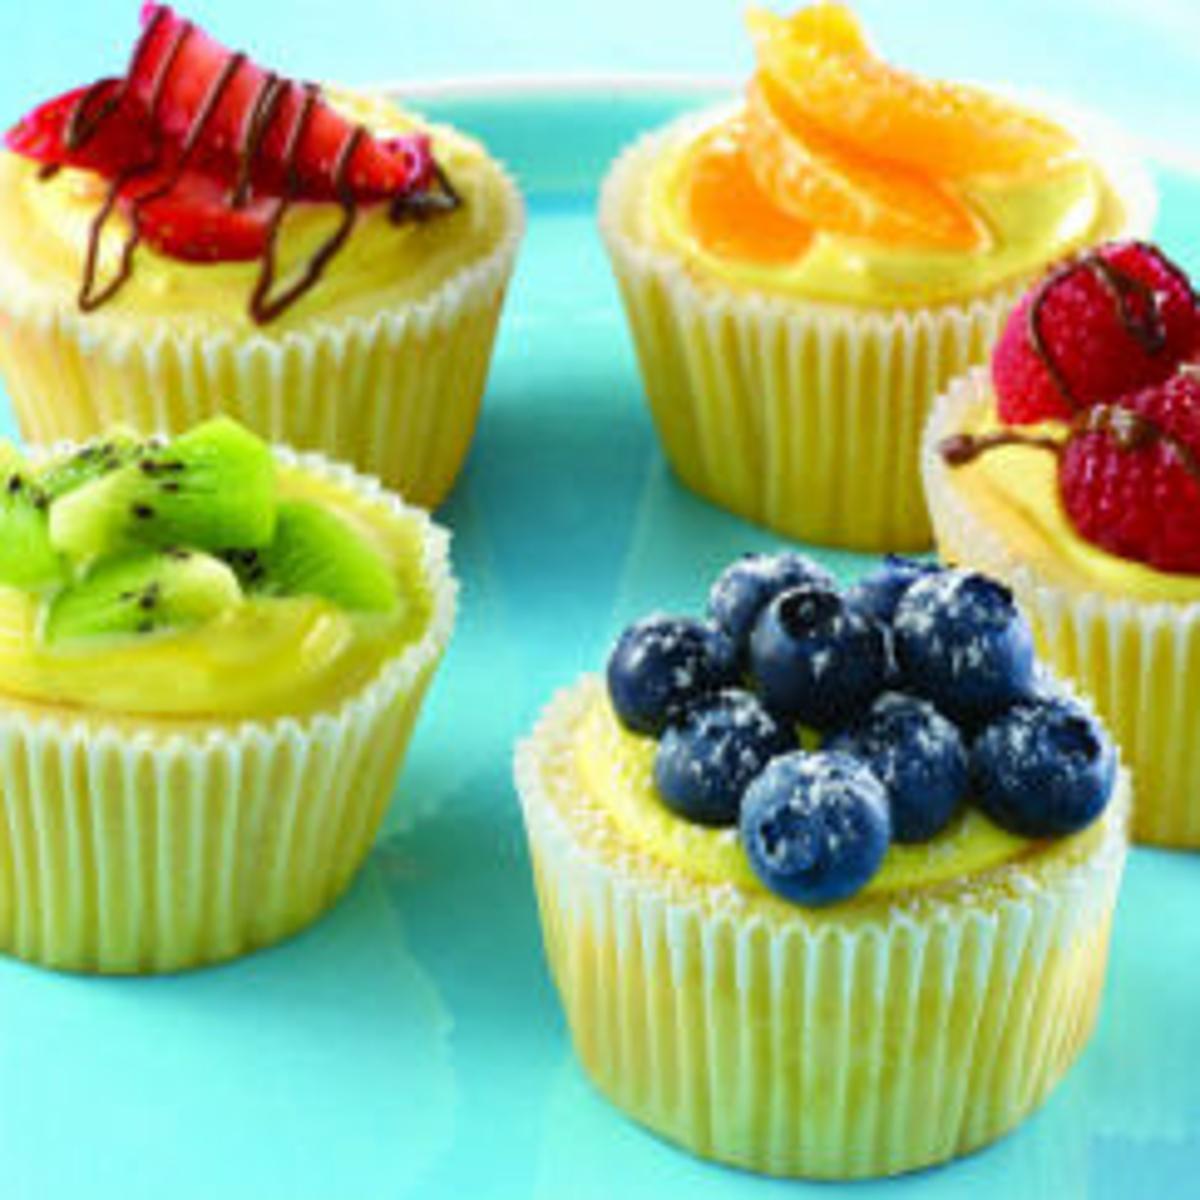 Foodie Friday: Spring inspired dessert | Blogs | omaha.com